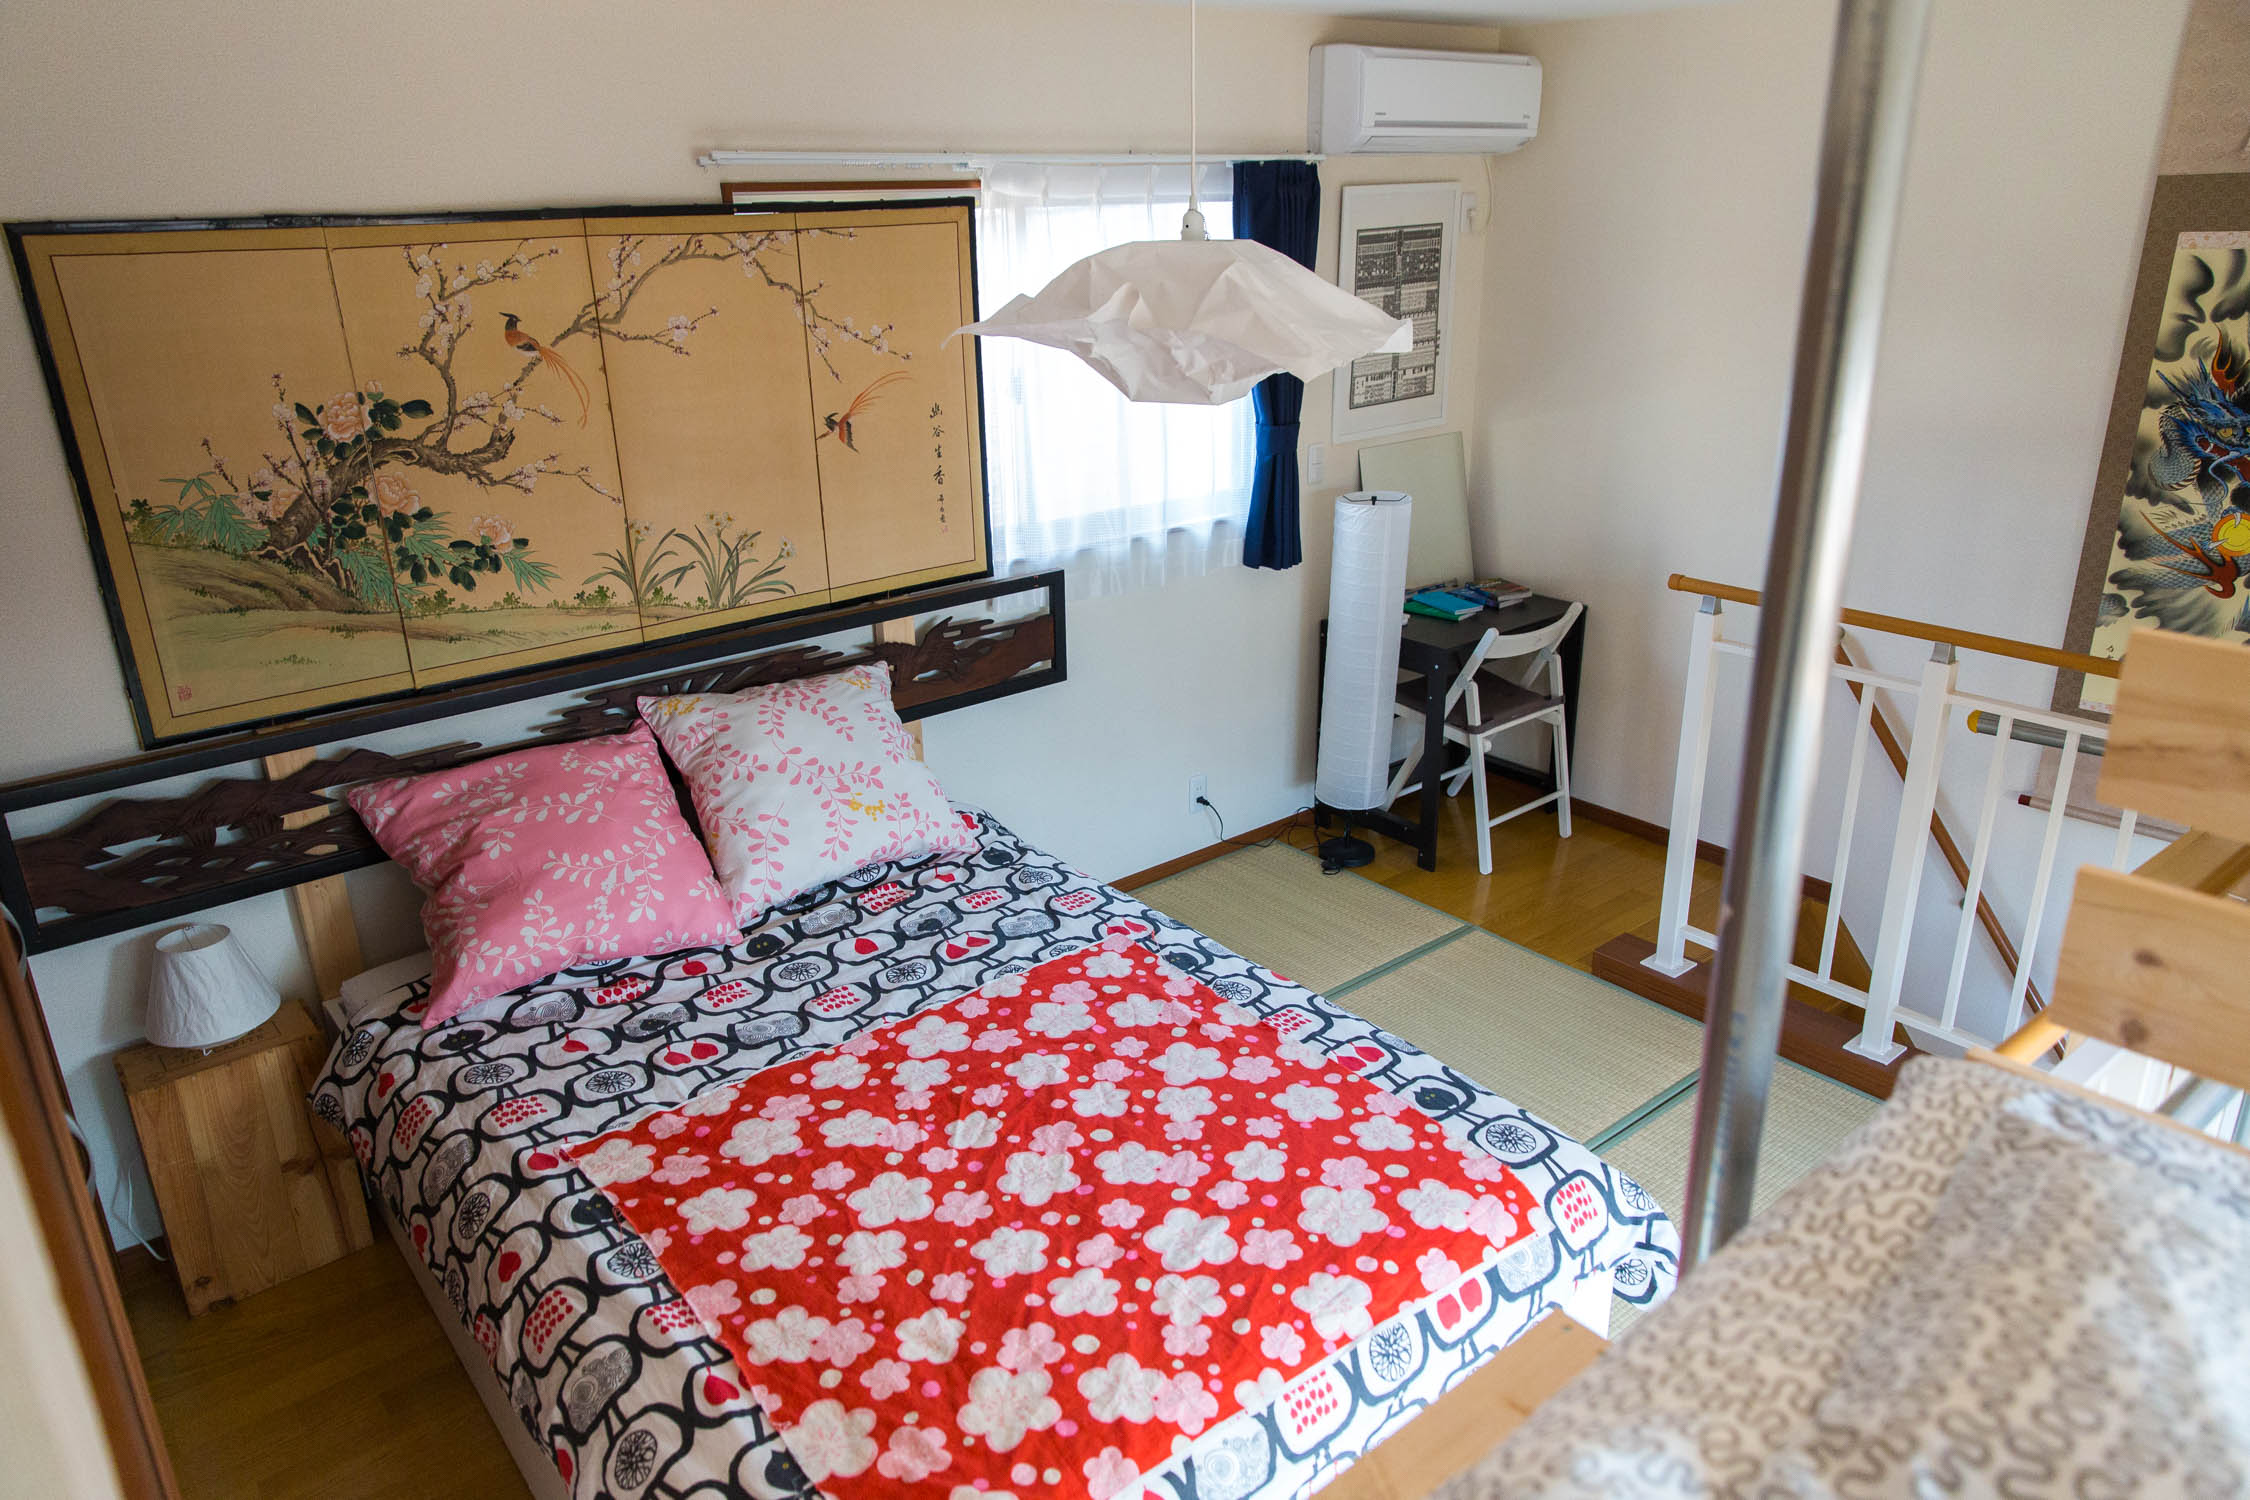 house_japan_kyoto_1_0001